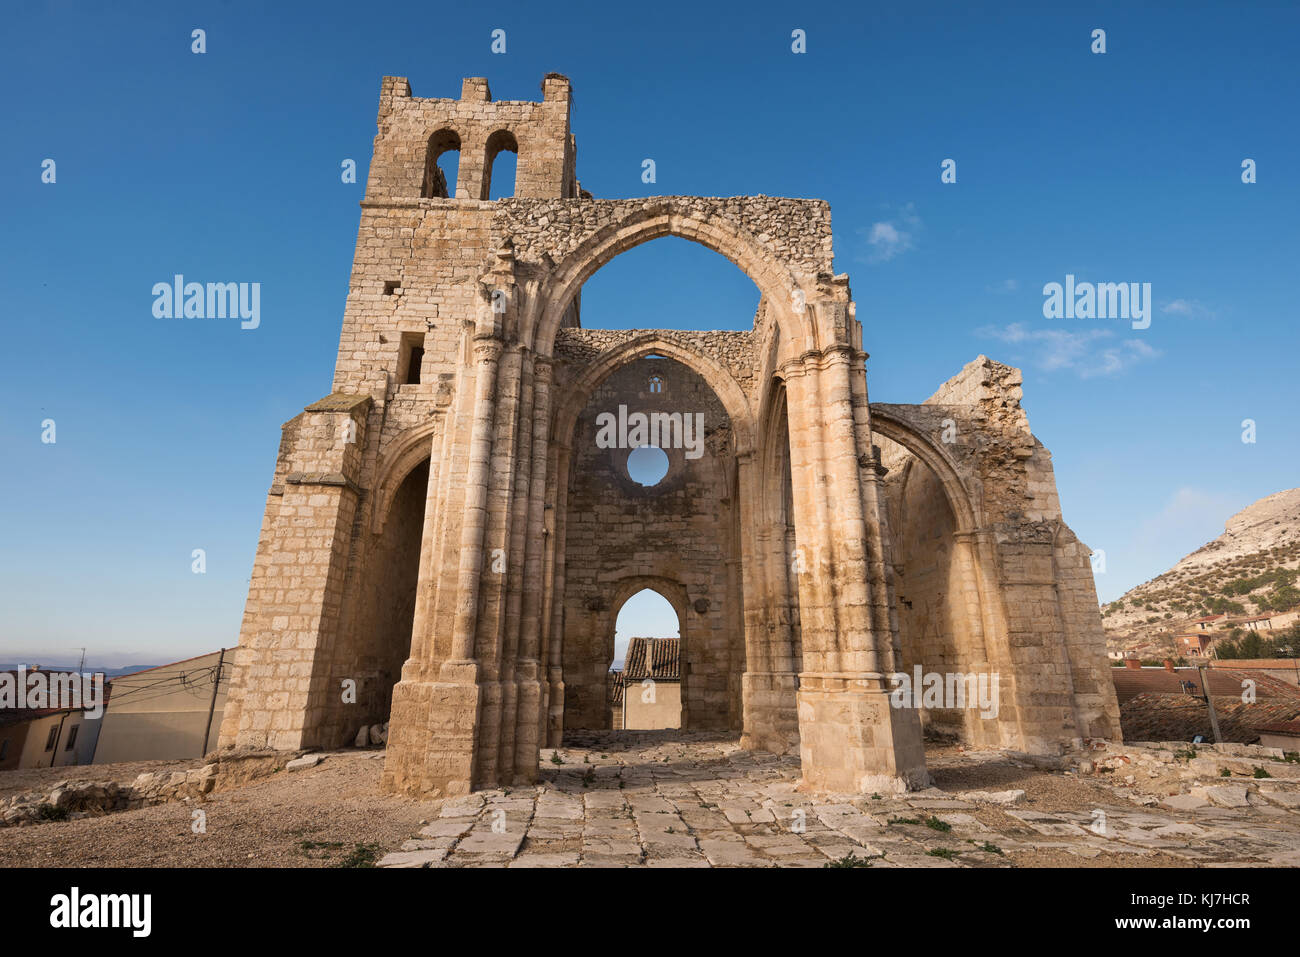 Ruins of abandoned church Santa Eulalia in Palenzuela, Palencia province, Spain. - Stock Image